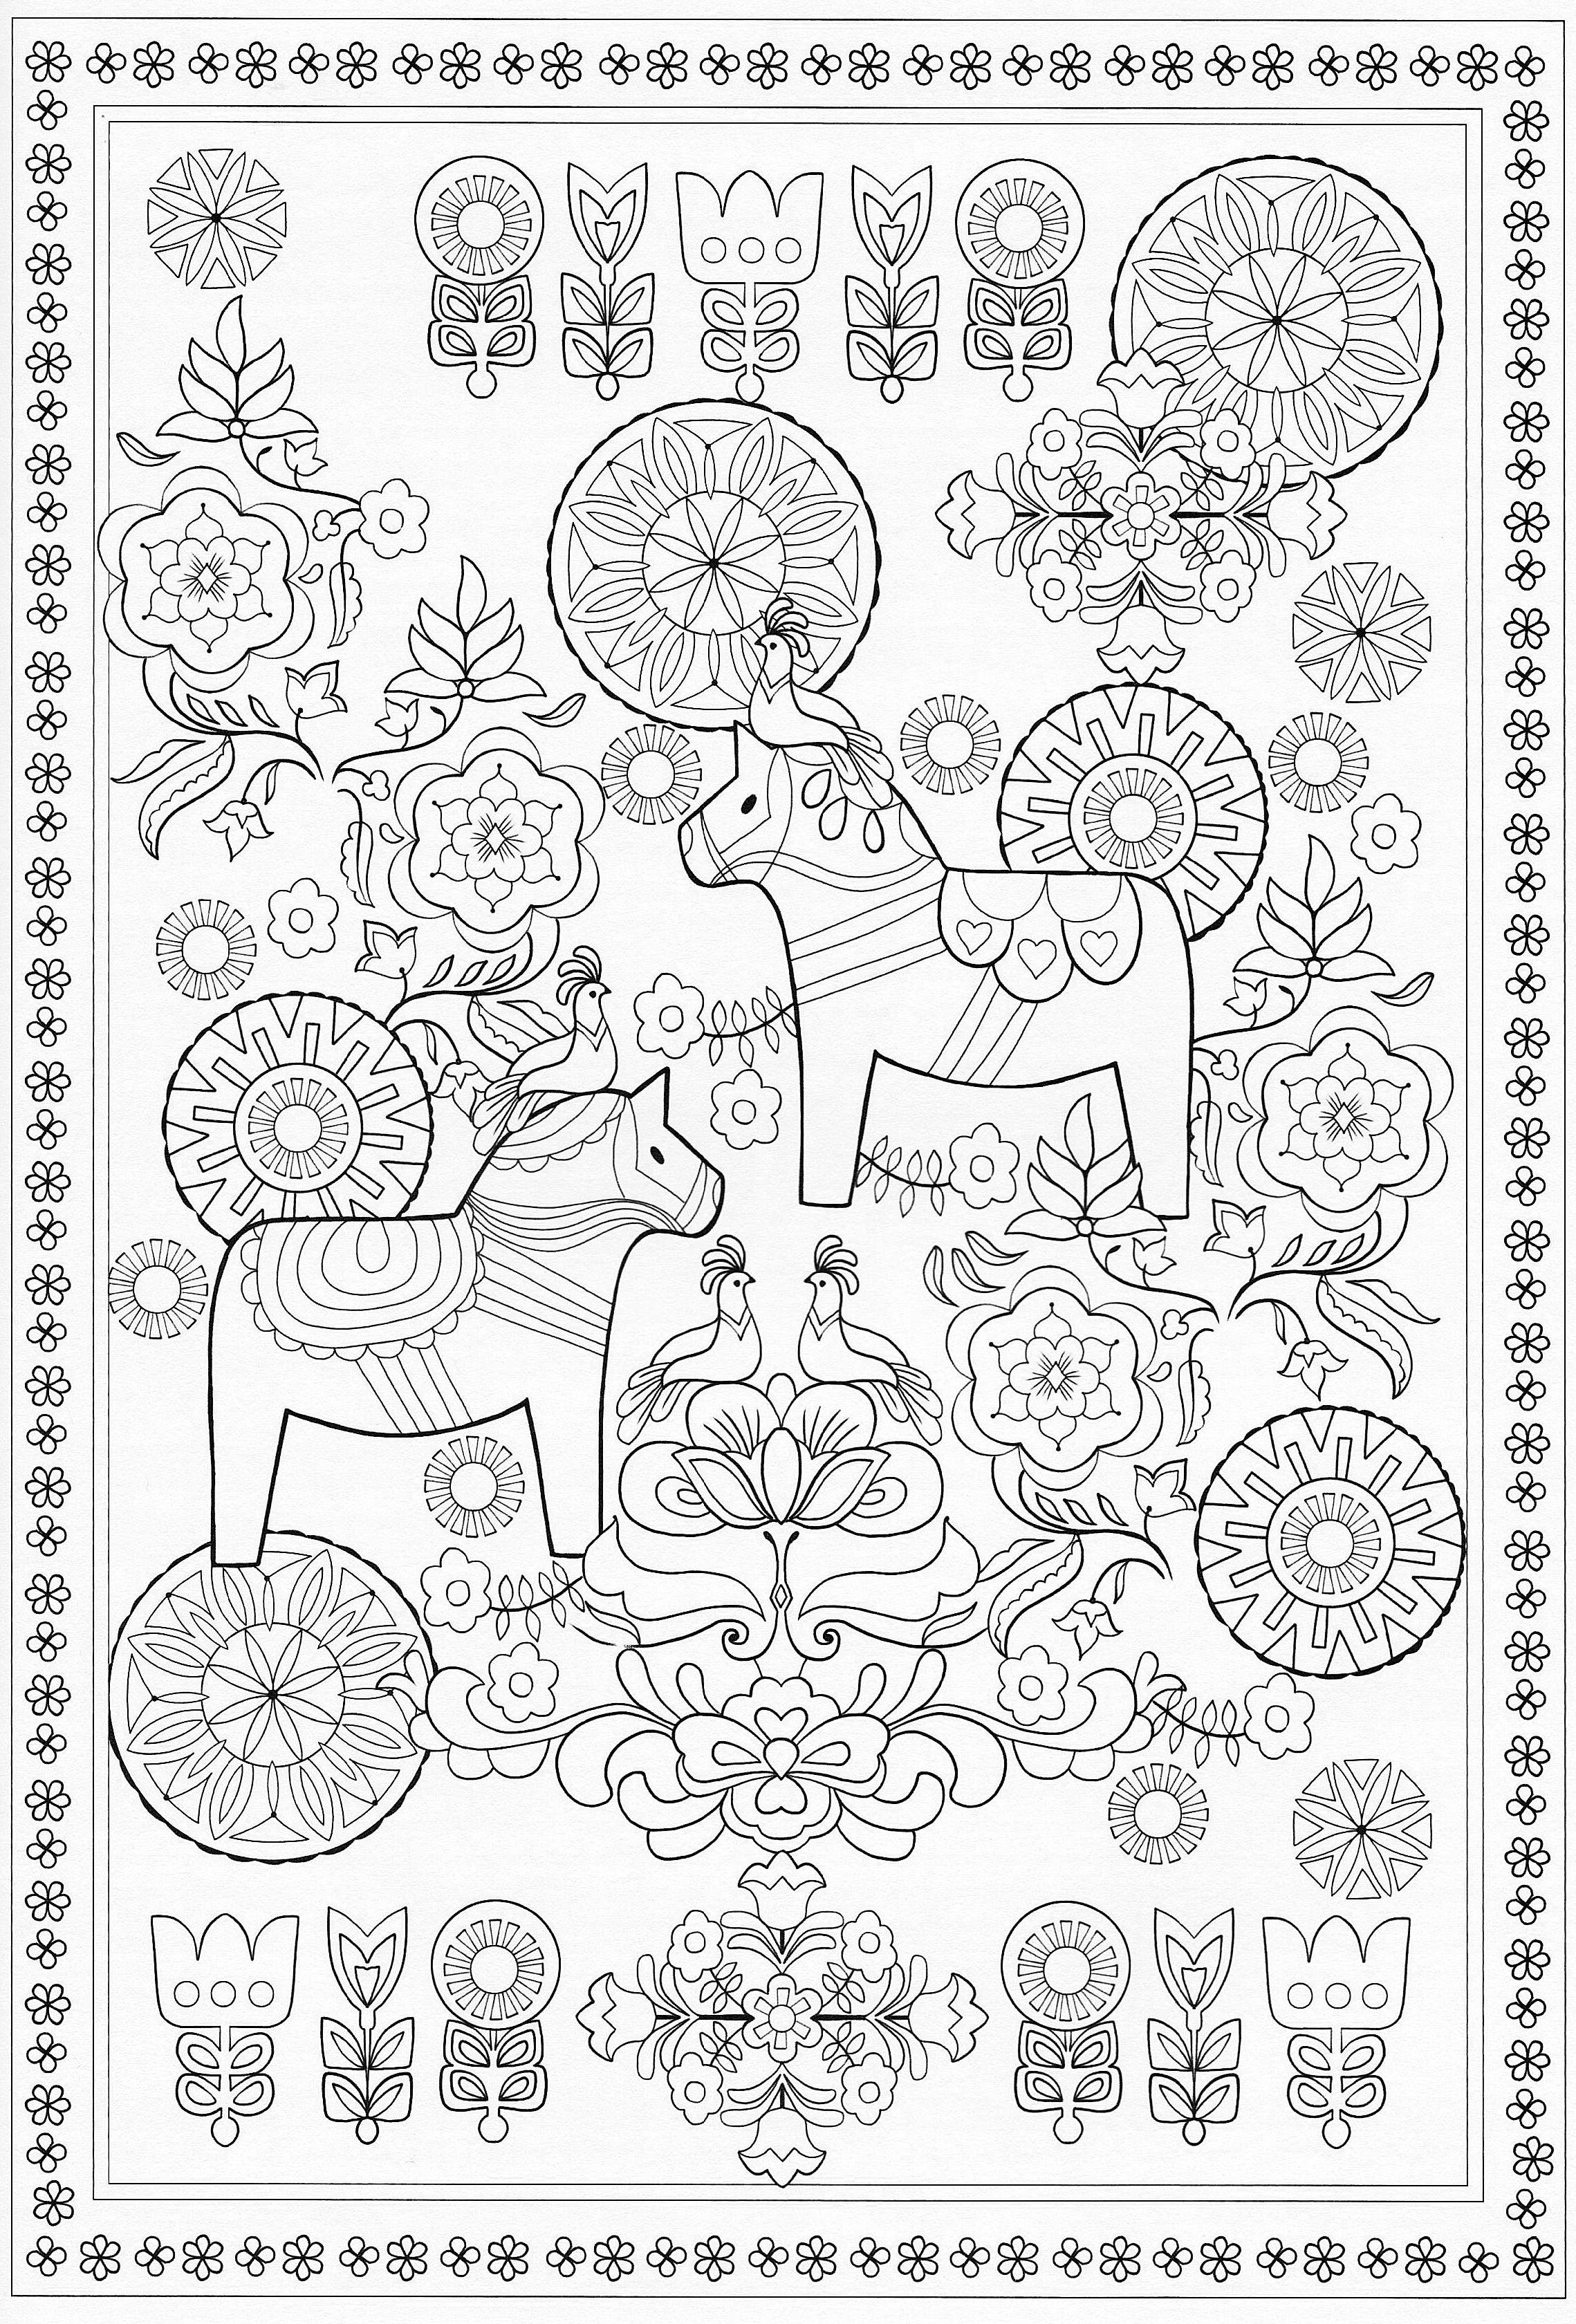 Scandinavian Coloring Book Pg 58 | Color Pages, Stencils